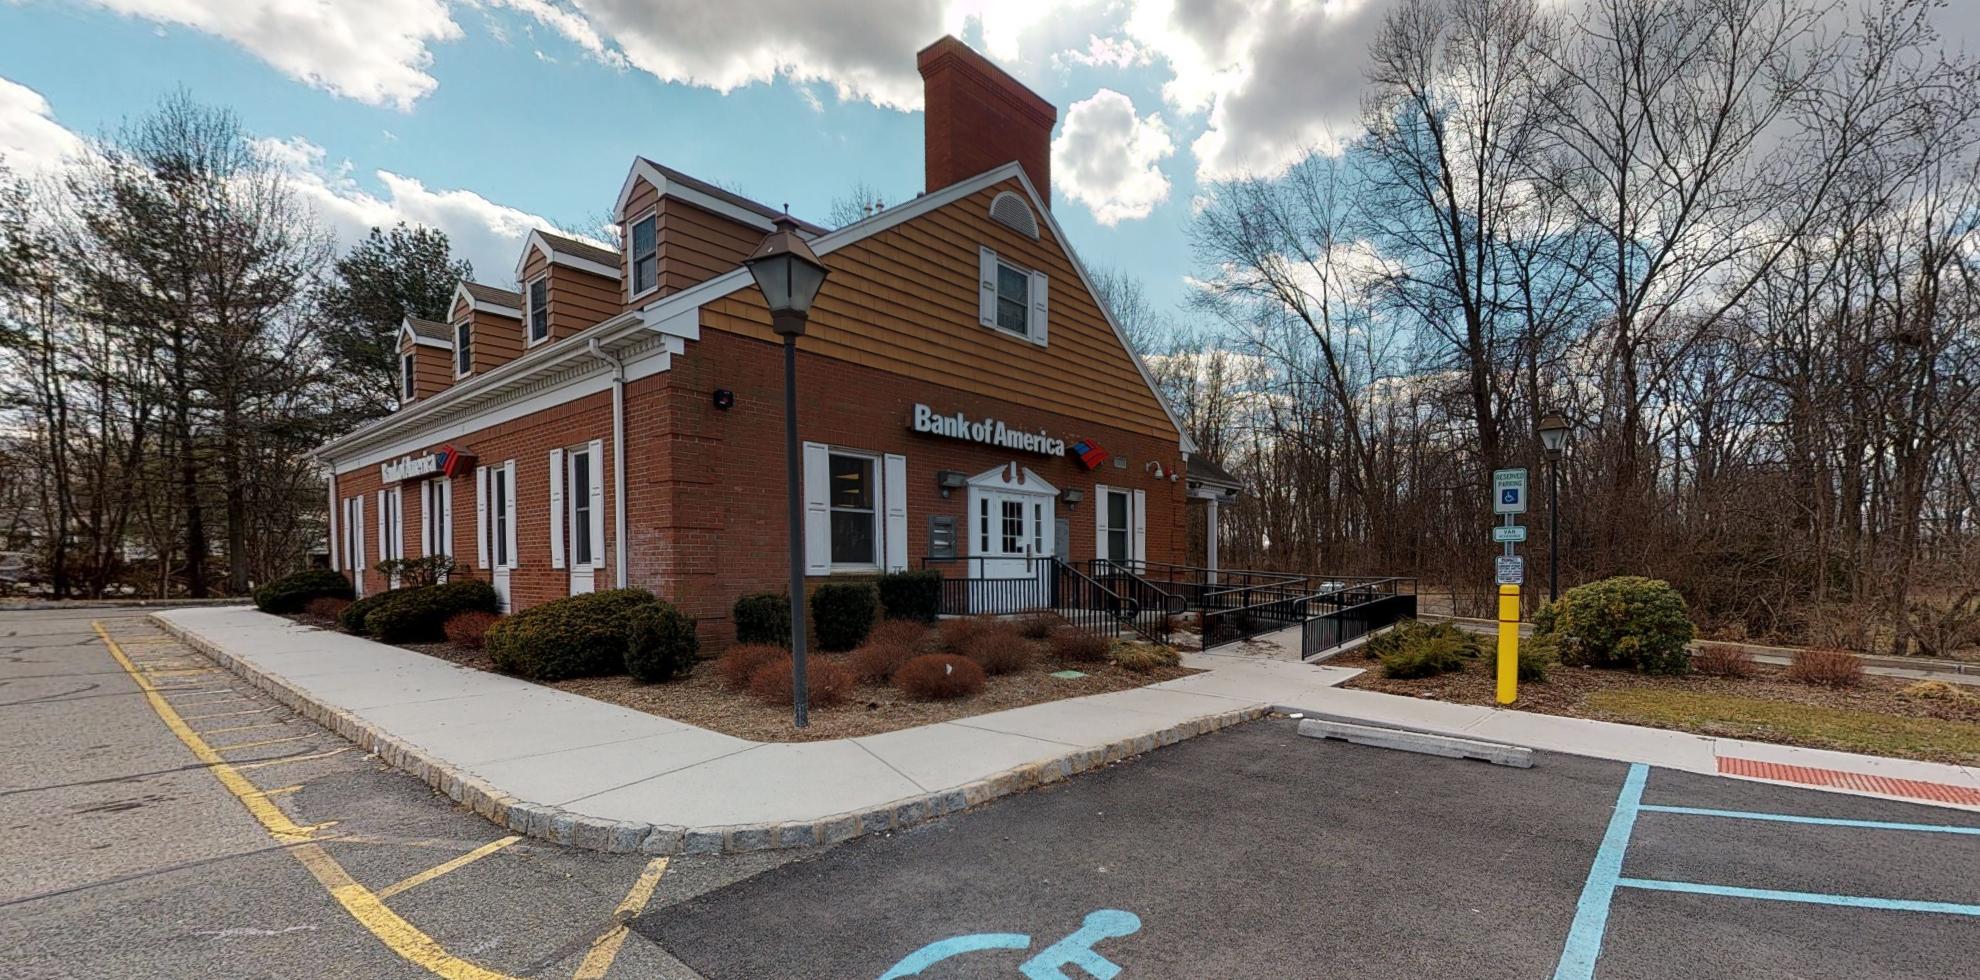 Bank of America financial center with drive-thru ATM | 161 Changebridge Rd, Montville, NJ 07045